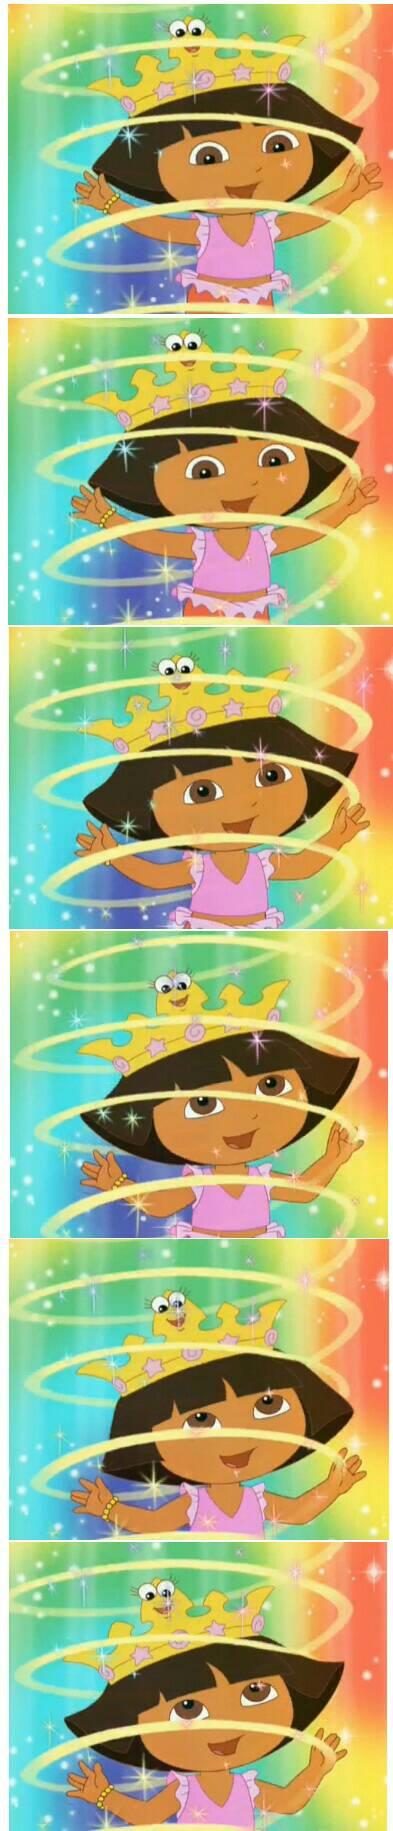 Dora the Explorer Mermaid Transformation 3 by ...